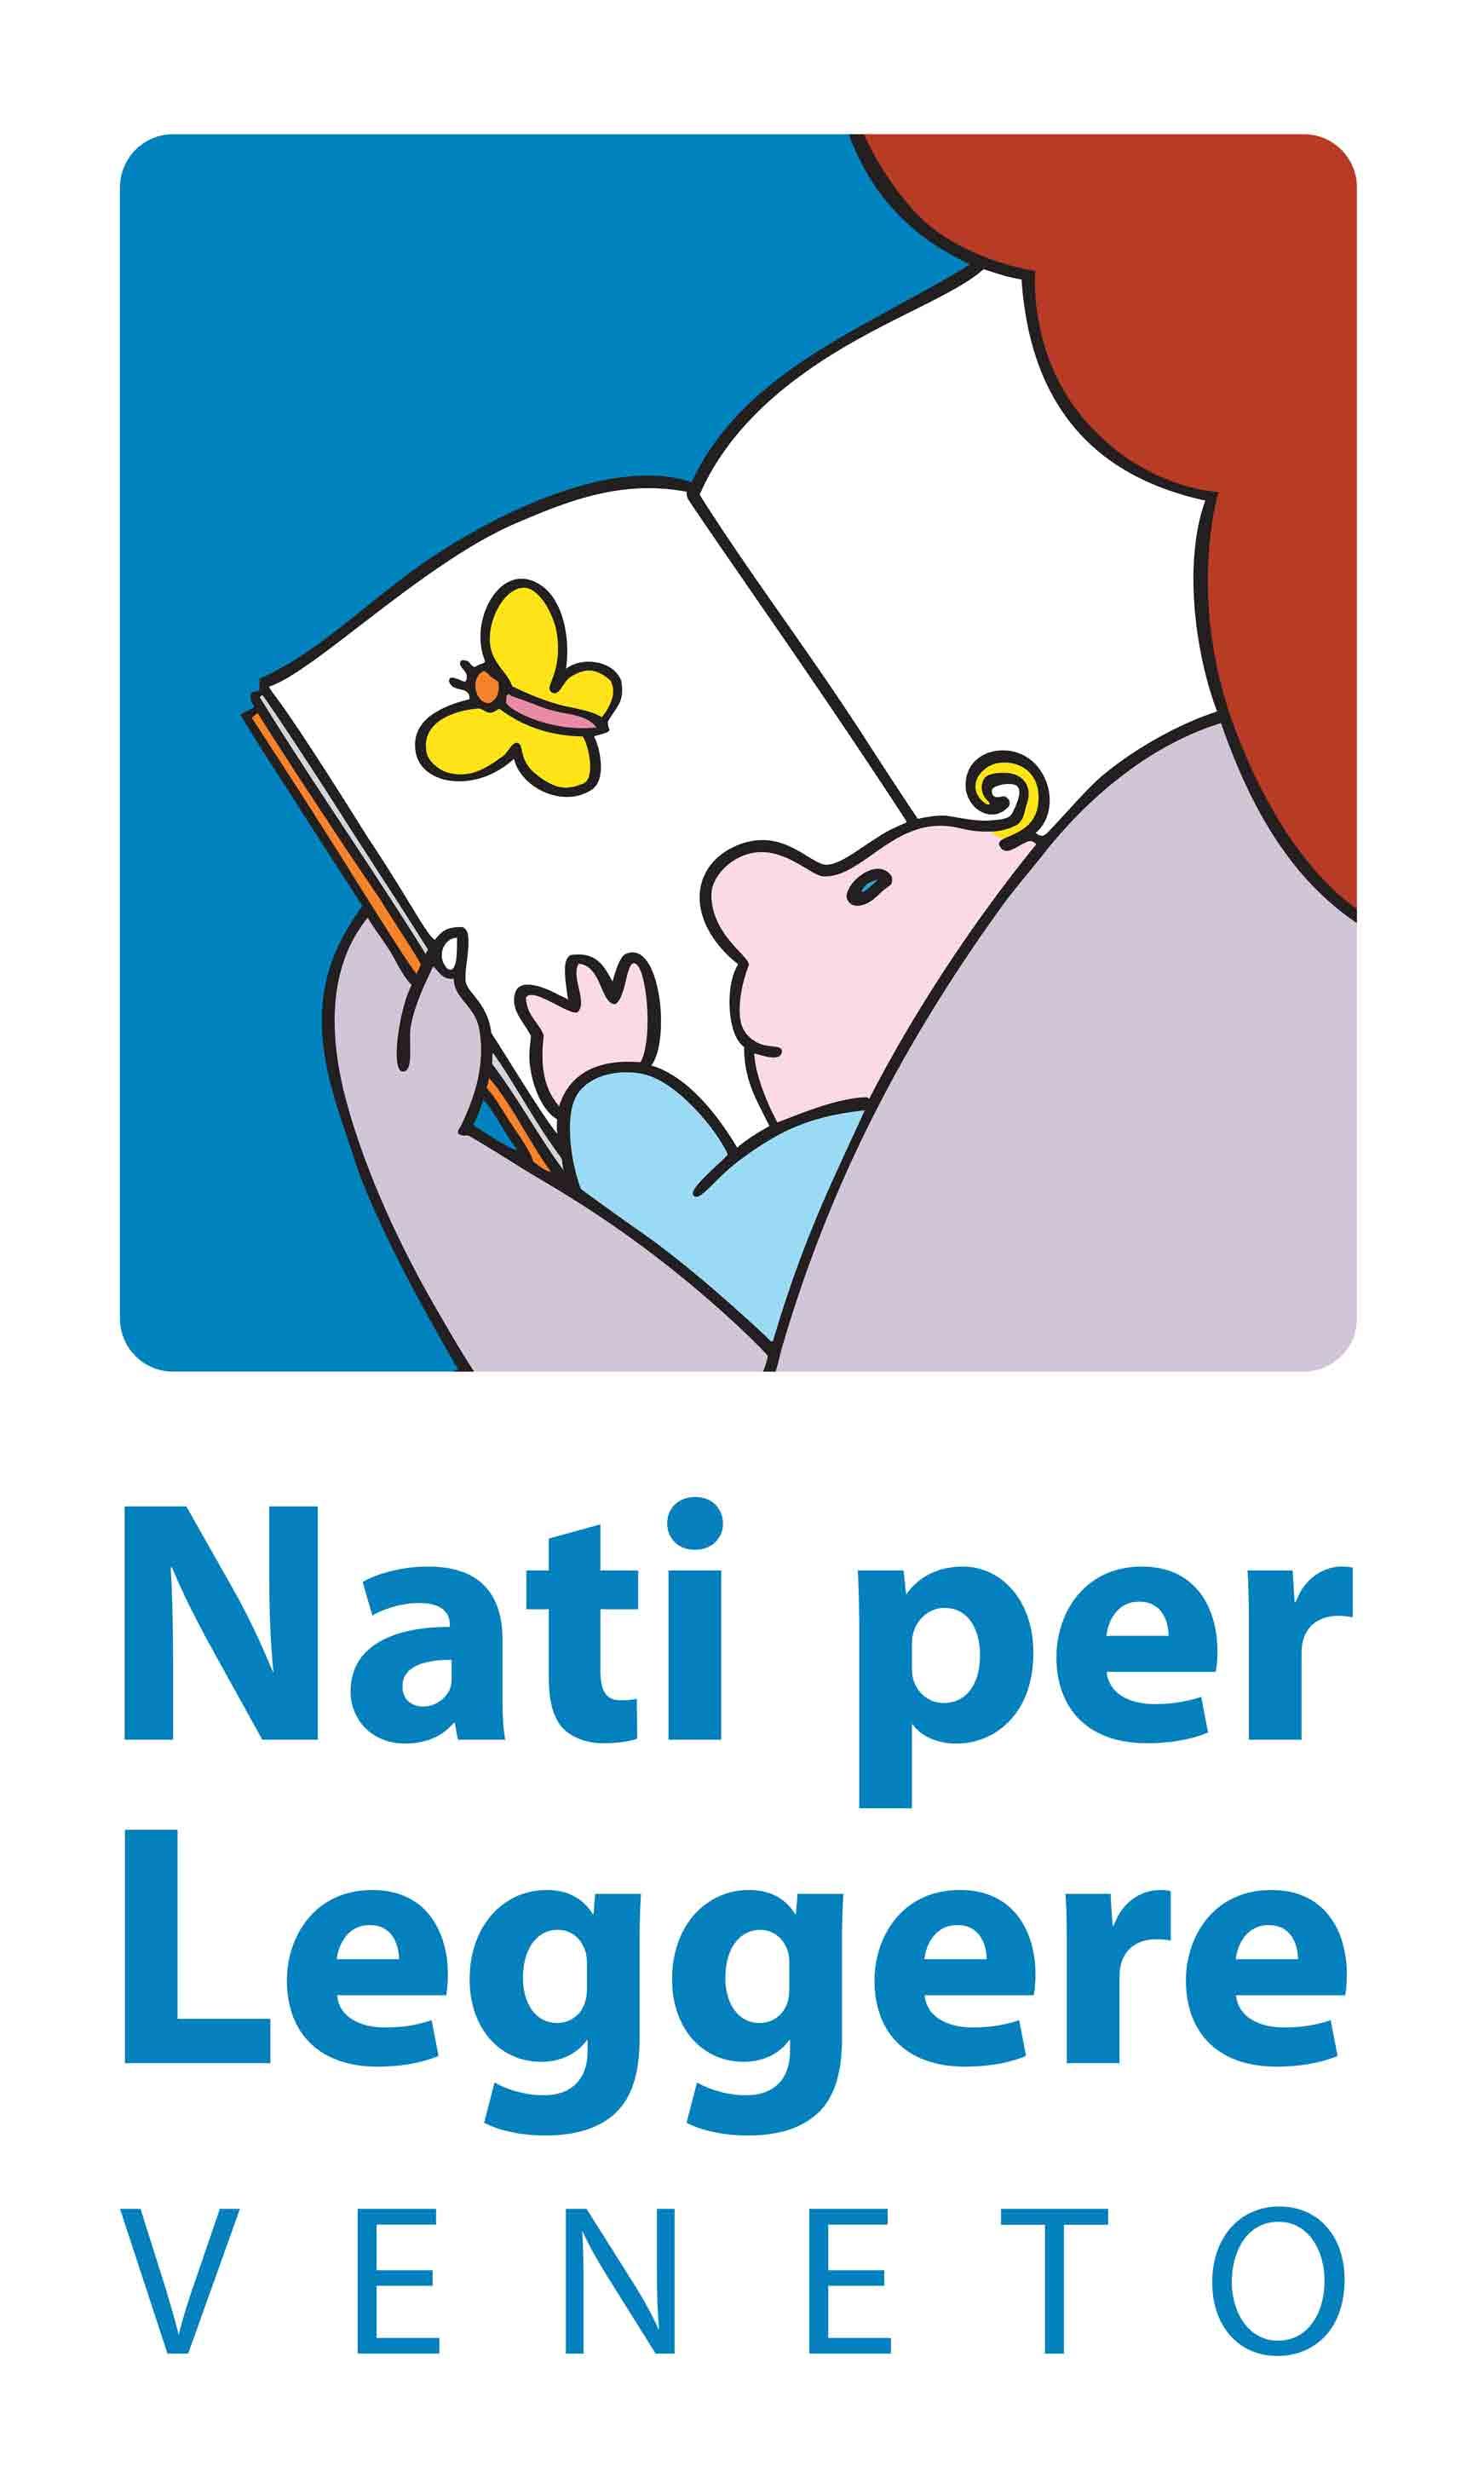 Nati per leggere Veneto